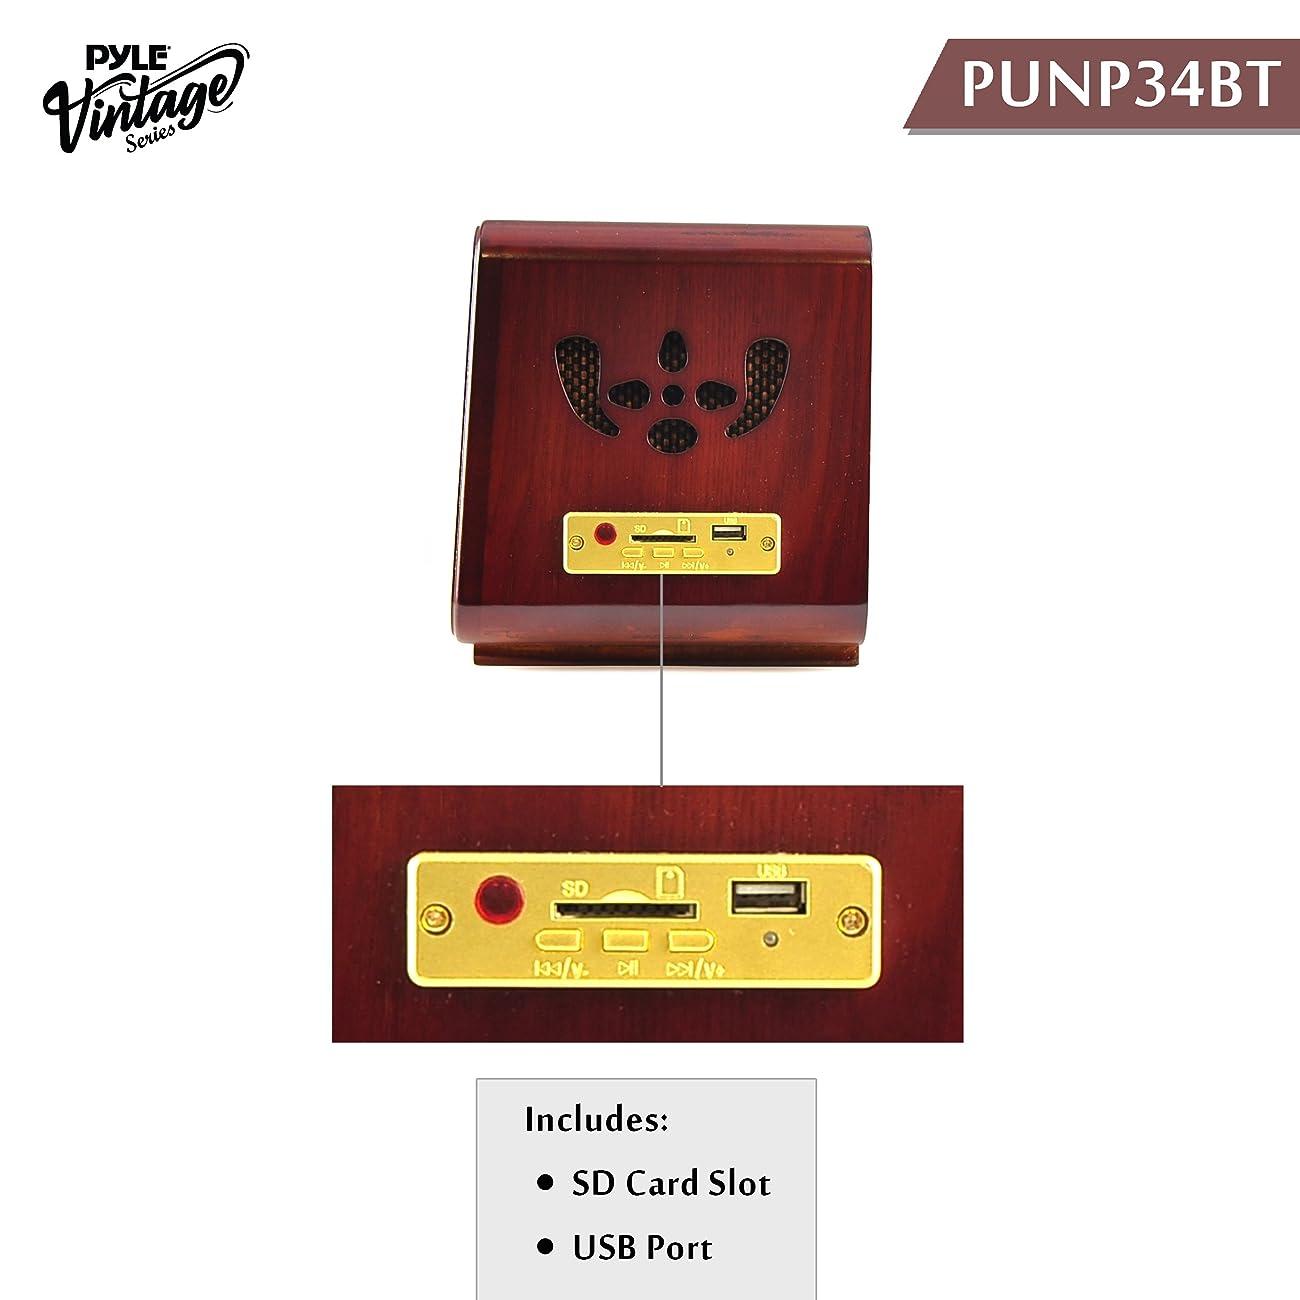 Pyle PUNP34BT Vintage Retro Classic Style Bluetooth Radio Sound System, USB/SD Readers, AM/FM Radio 1